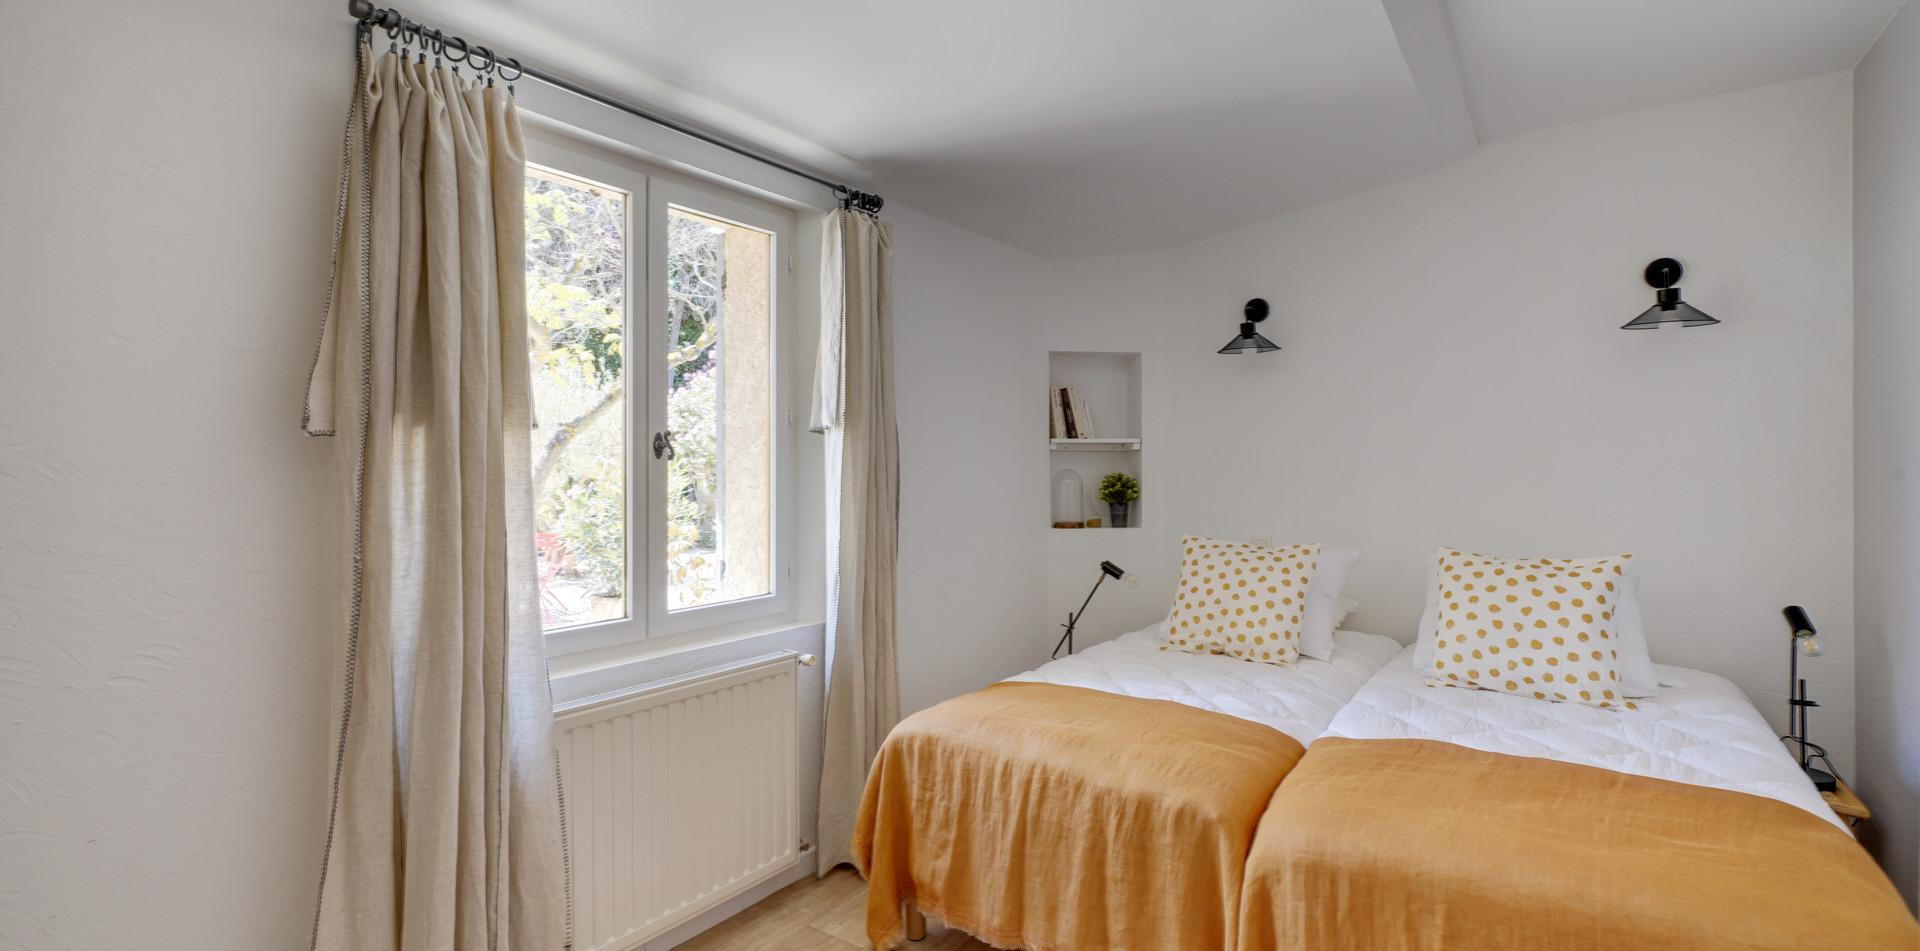 House of Dreamers, bedroom 3, Mas Saint-Gens